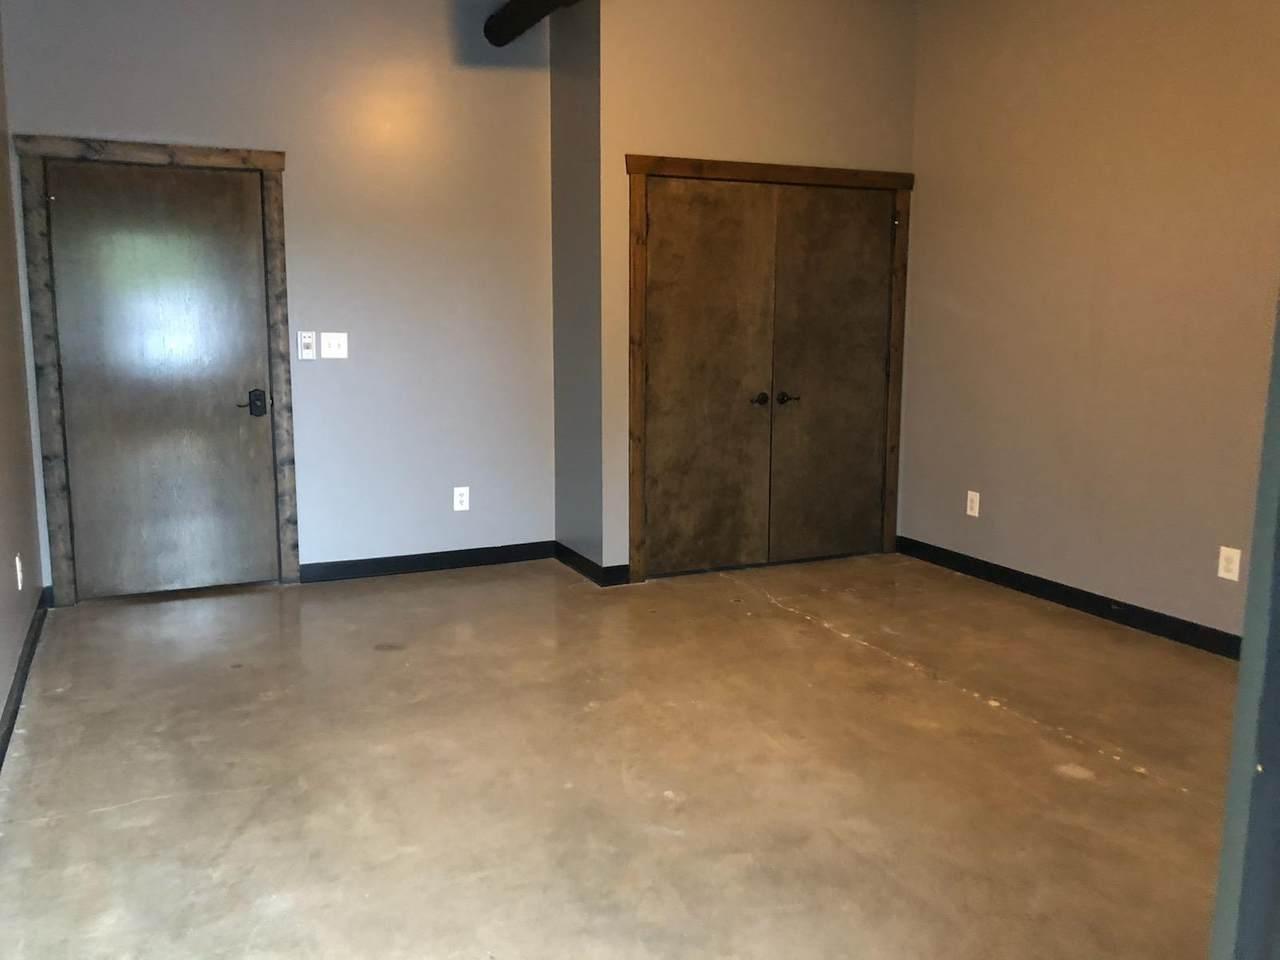 30 Crossland Ave, Suite 103A - Photo 1